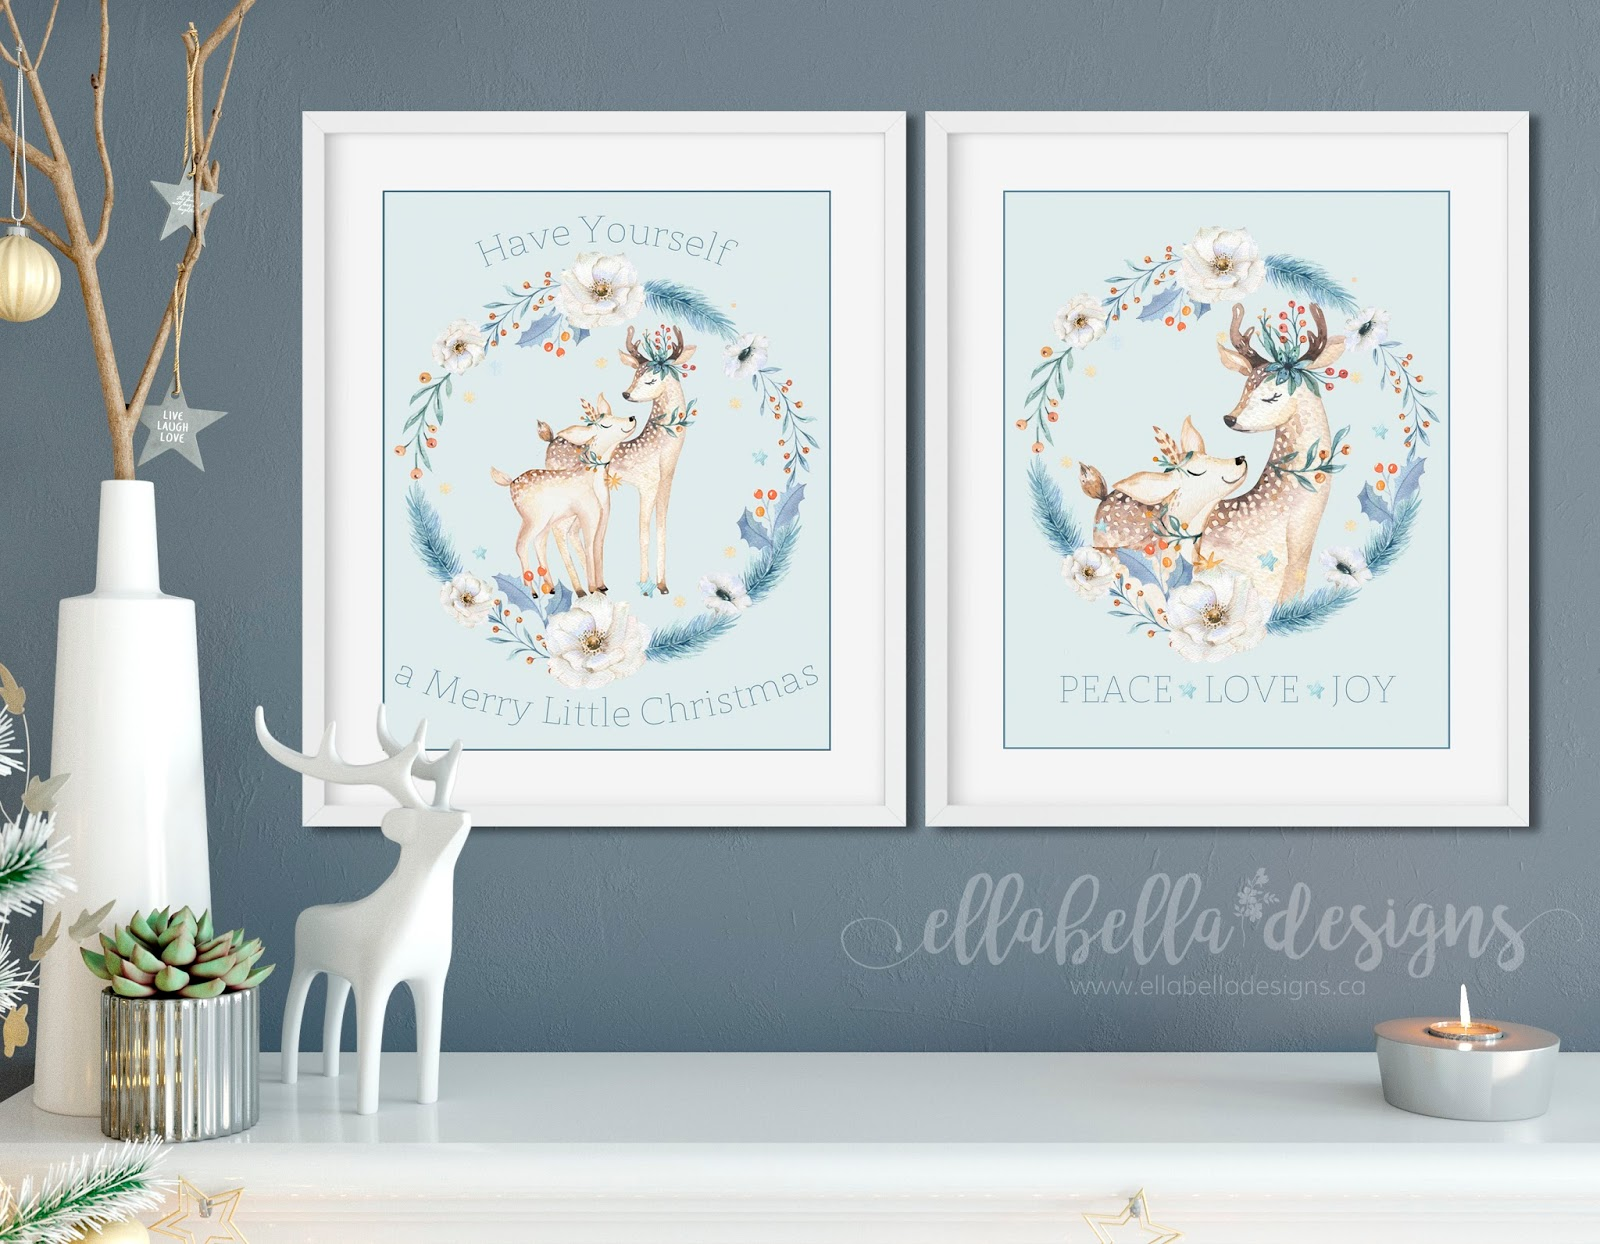 ellabella designs free christmas wall art decor printables. Black Bedroom Furniture Sets. Home Design Ideas